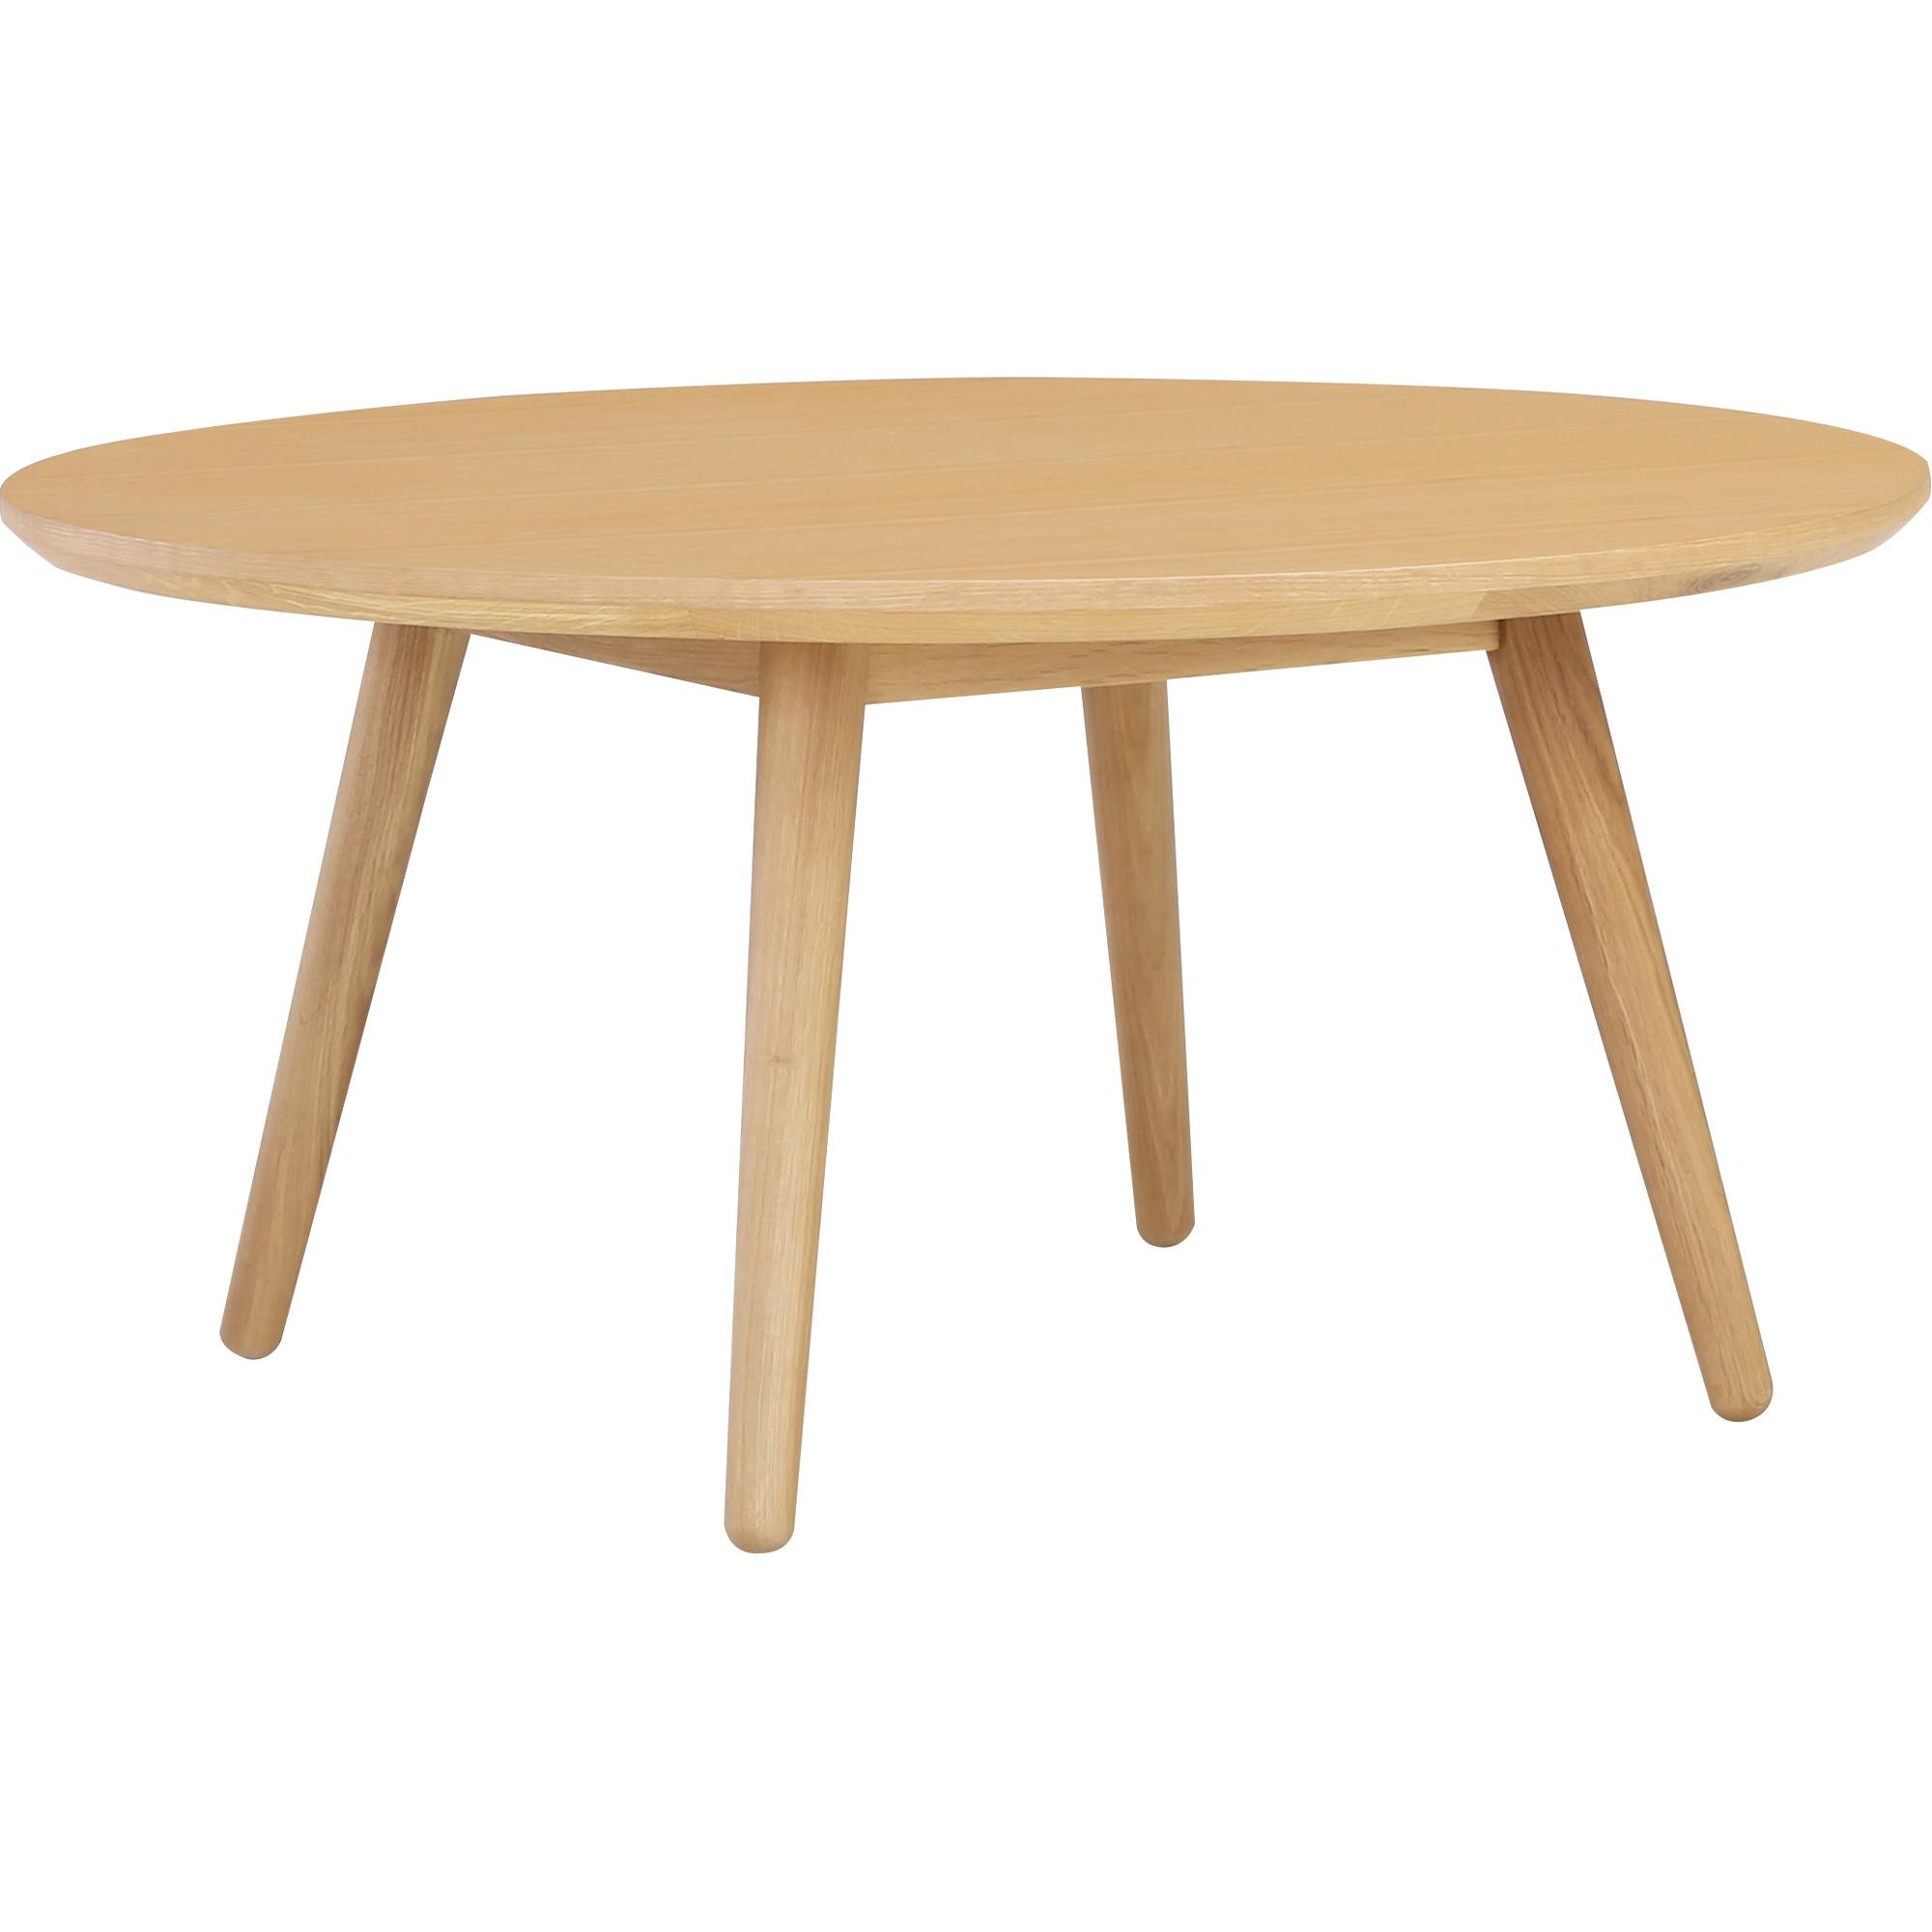 Round Wood Coffee Table.Oringo Round Oak Wood Coffee Table